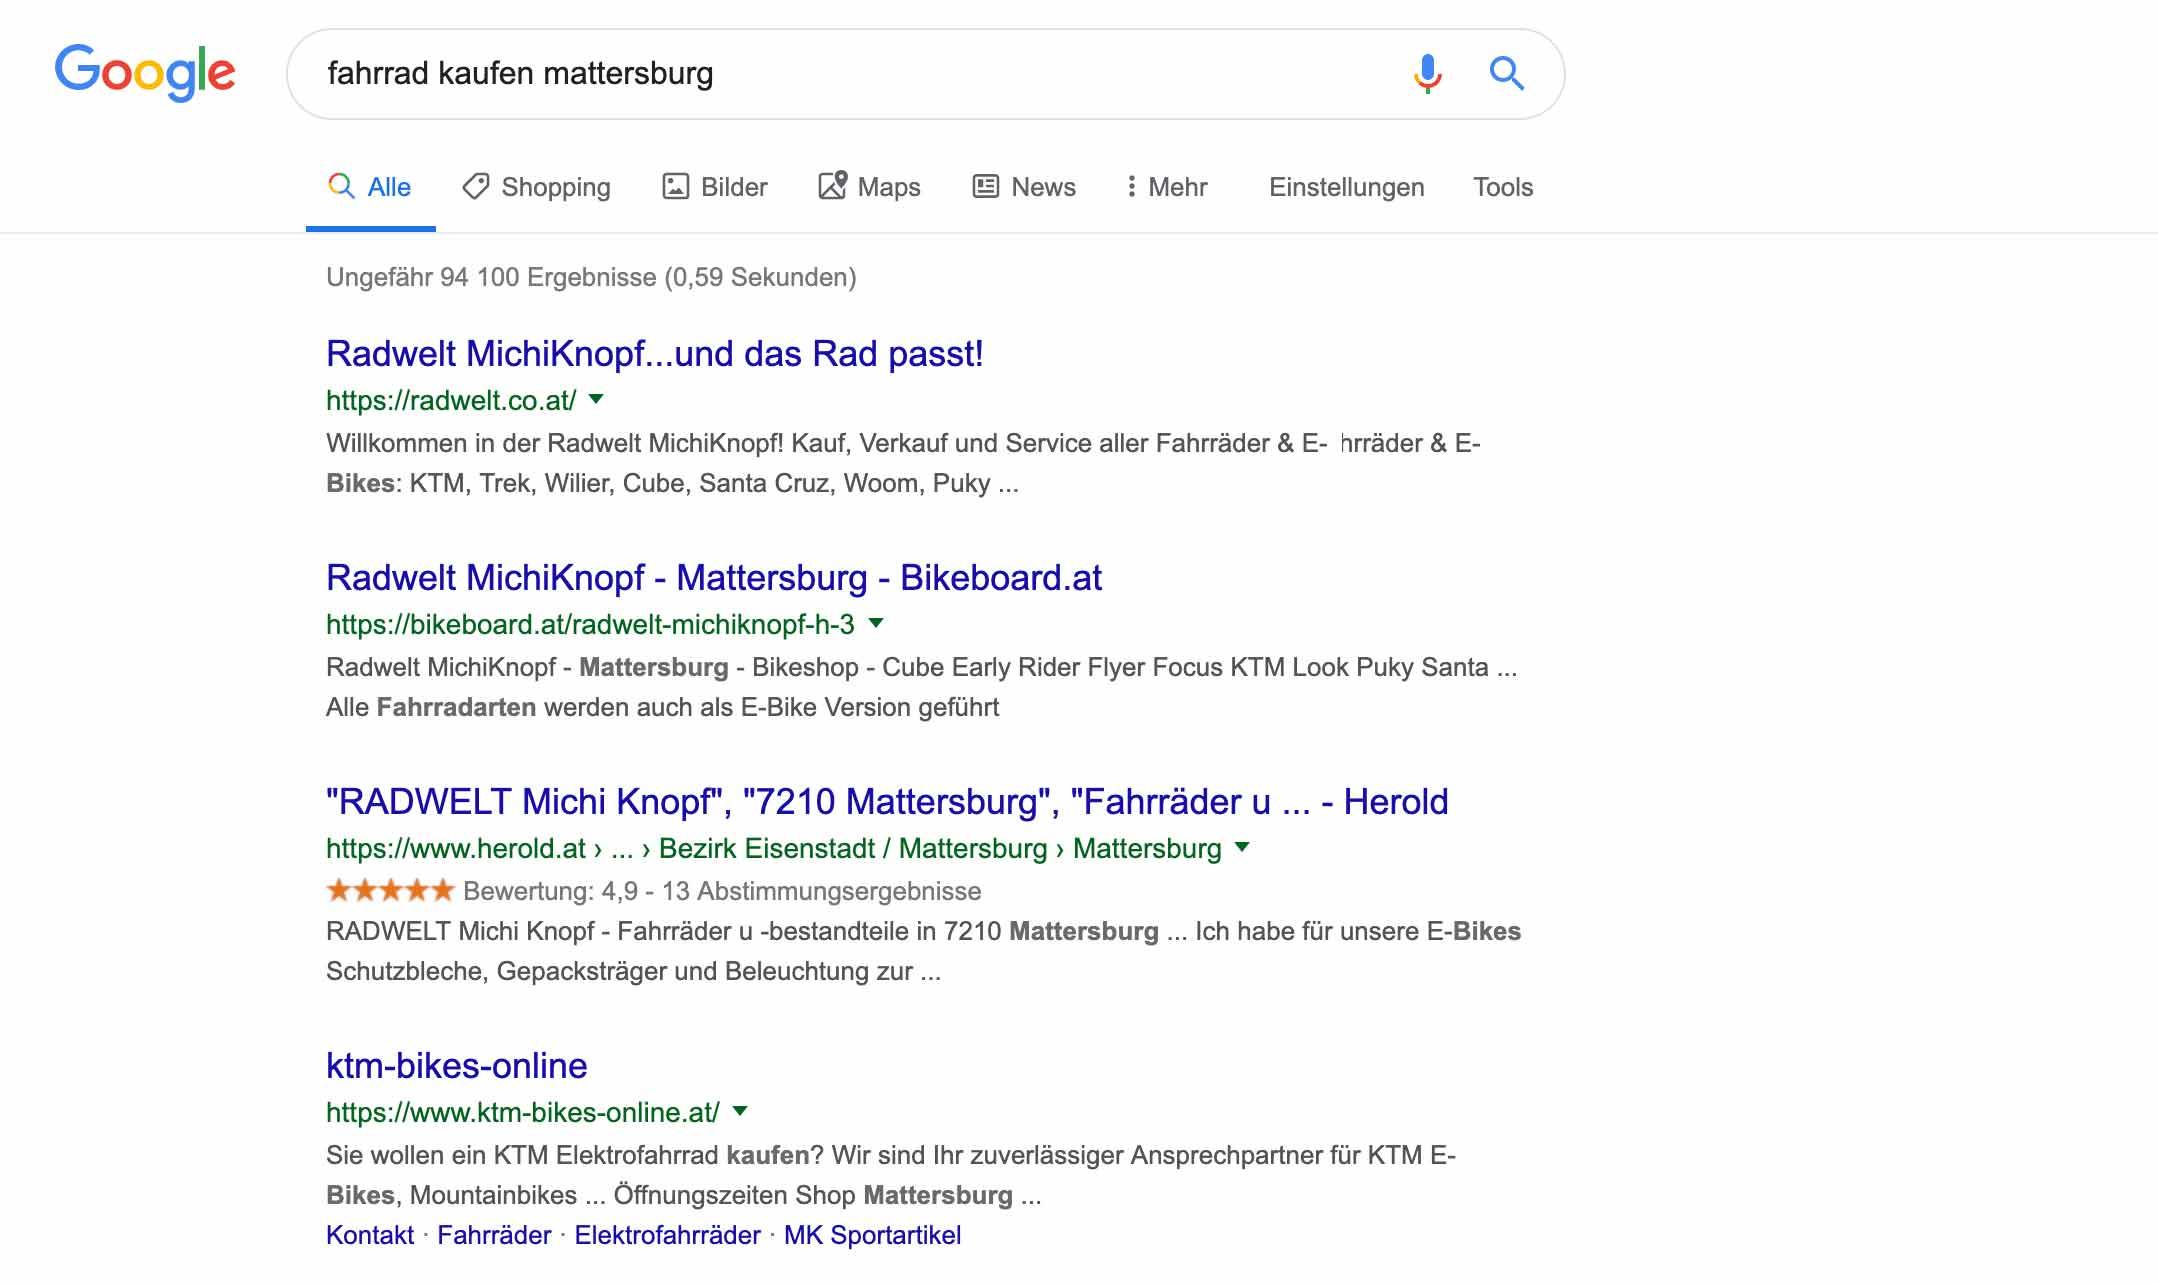 Wordpress Webseite in Google Ergebnis